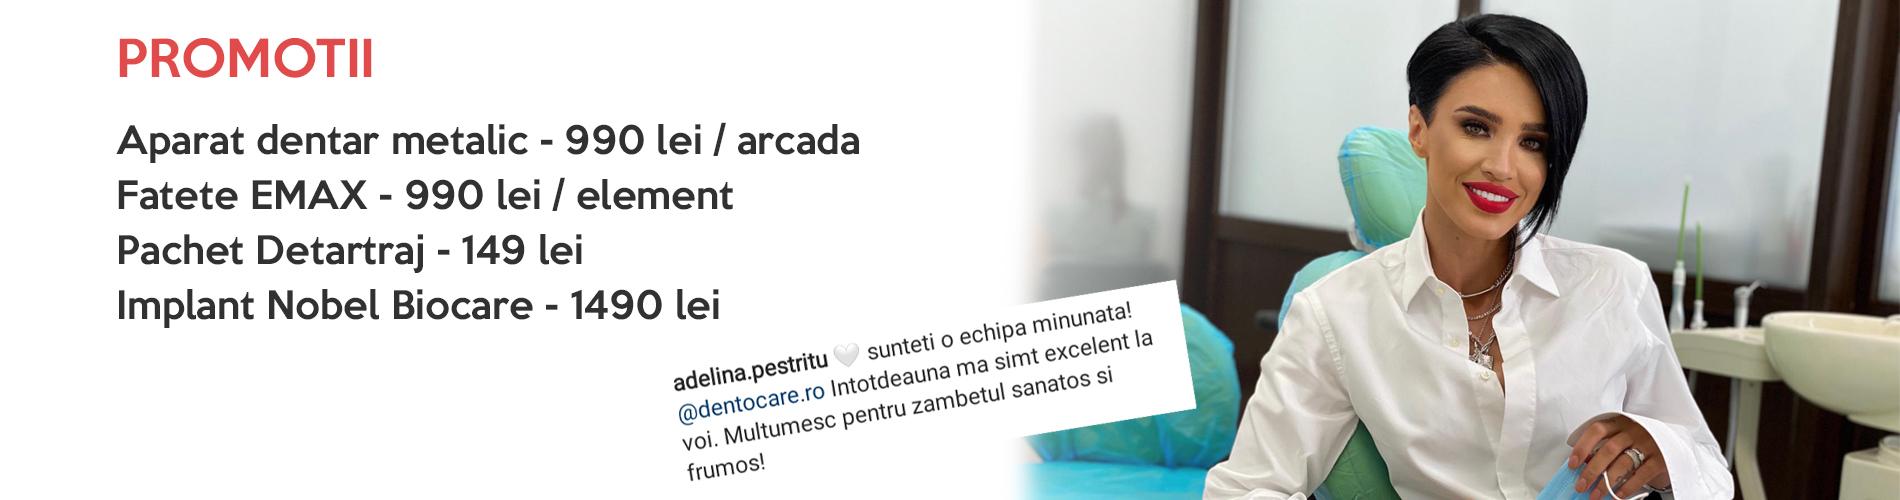 banner clinica stomatologica dentocare adelina pestritu